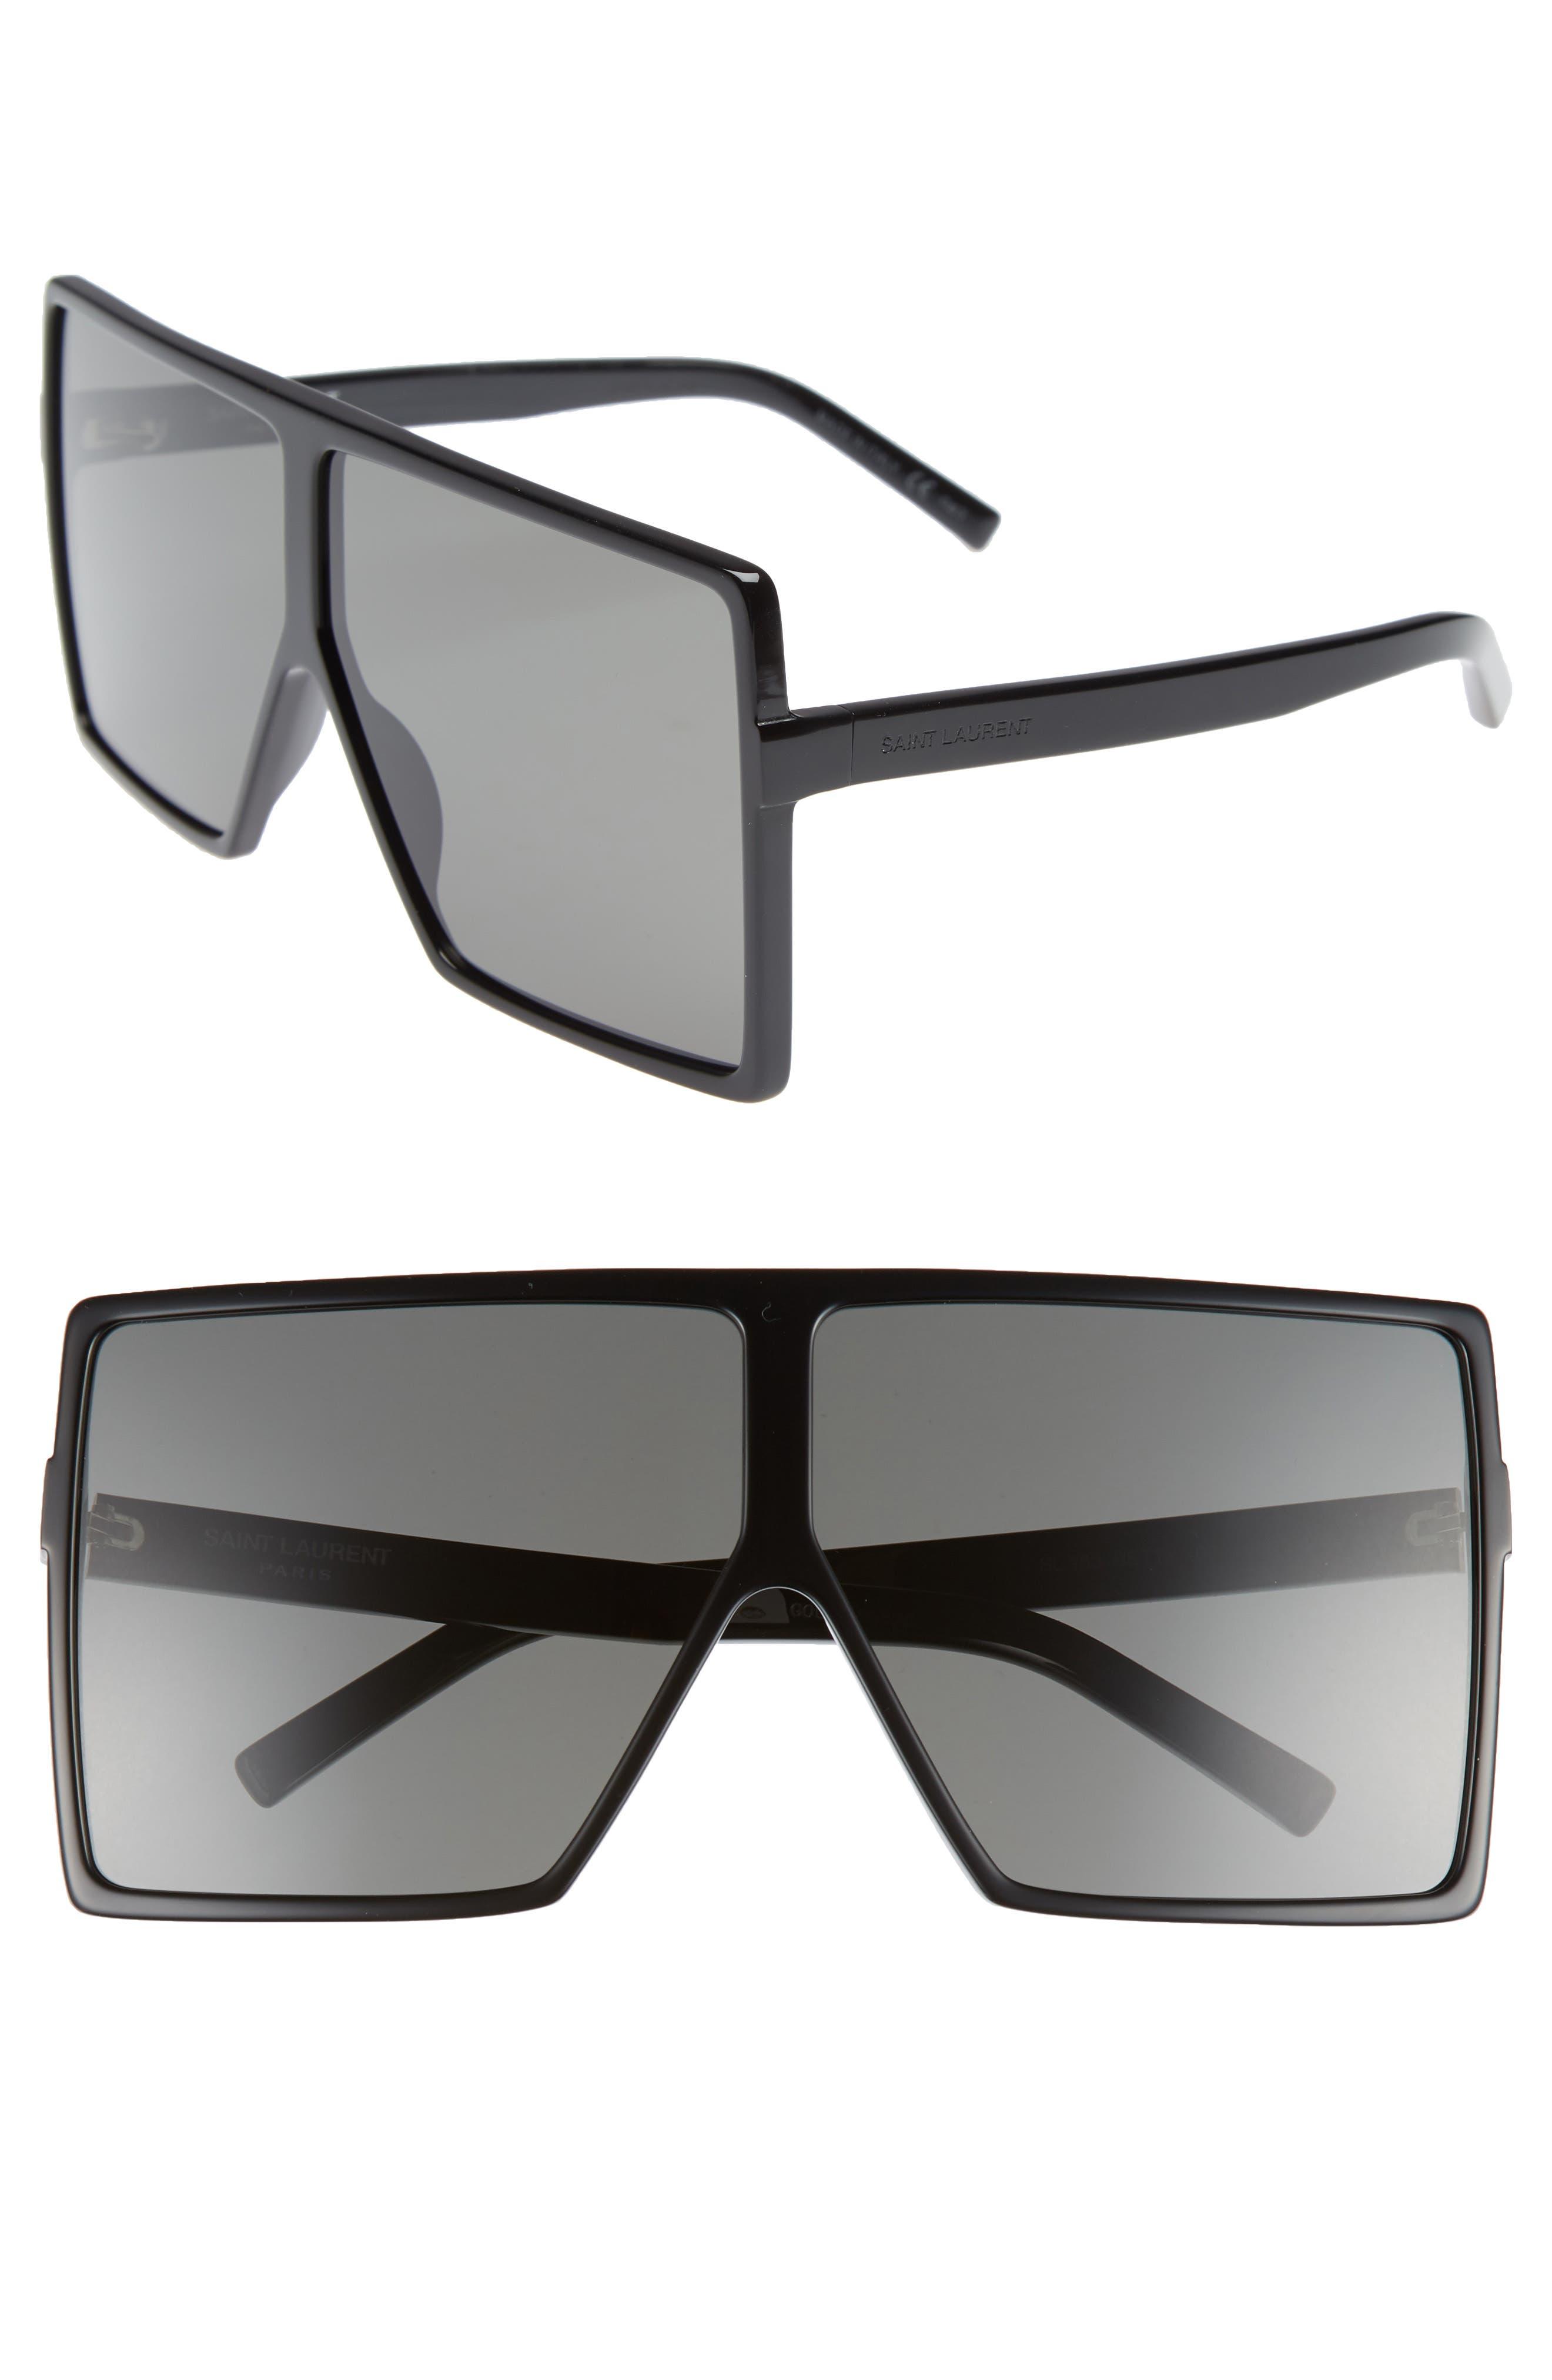 68mm Oversize Square Sunglasses,                             Main thumbnail 1, color,                             004